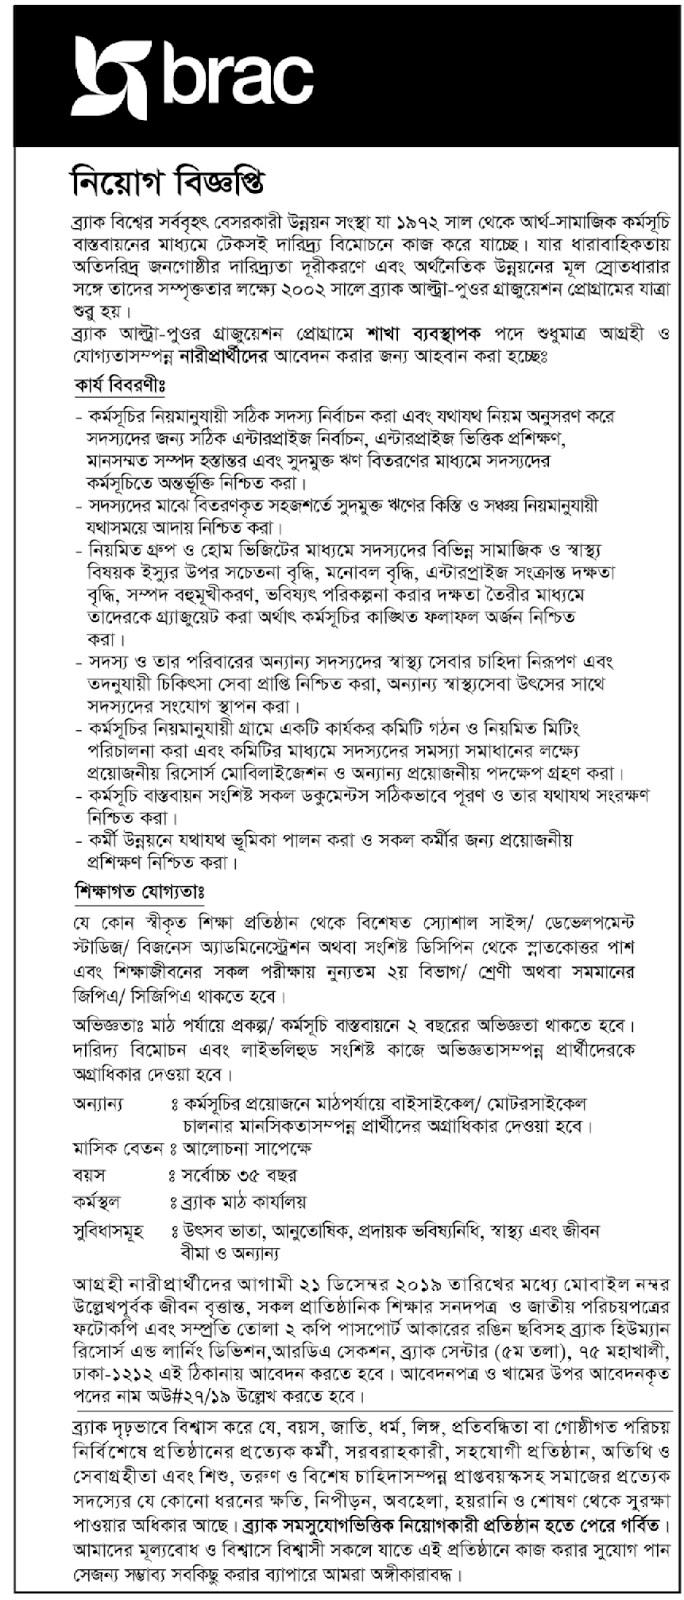 BRAC NGO Published Jobs Circular 2020